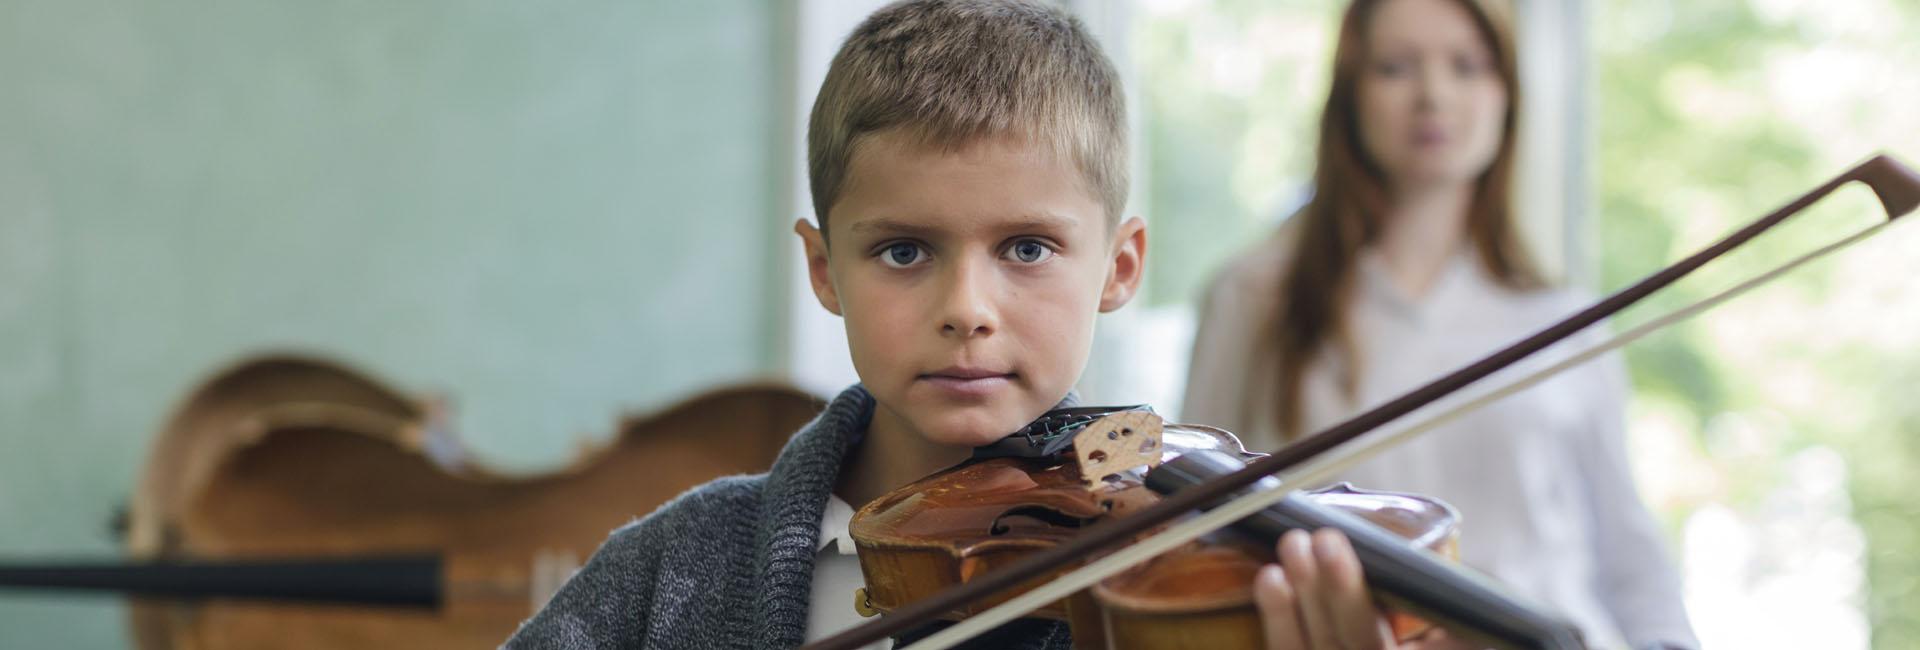 Piano Lessons & Guitar Lessons Teachers in Temiskaming Shores